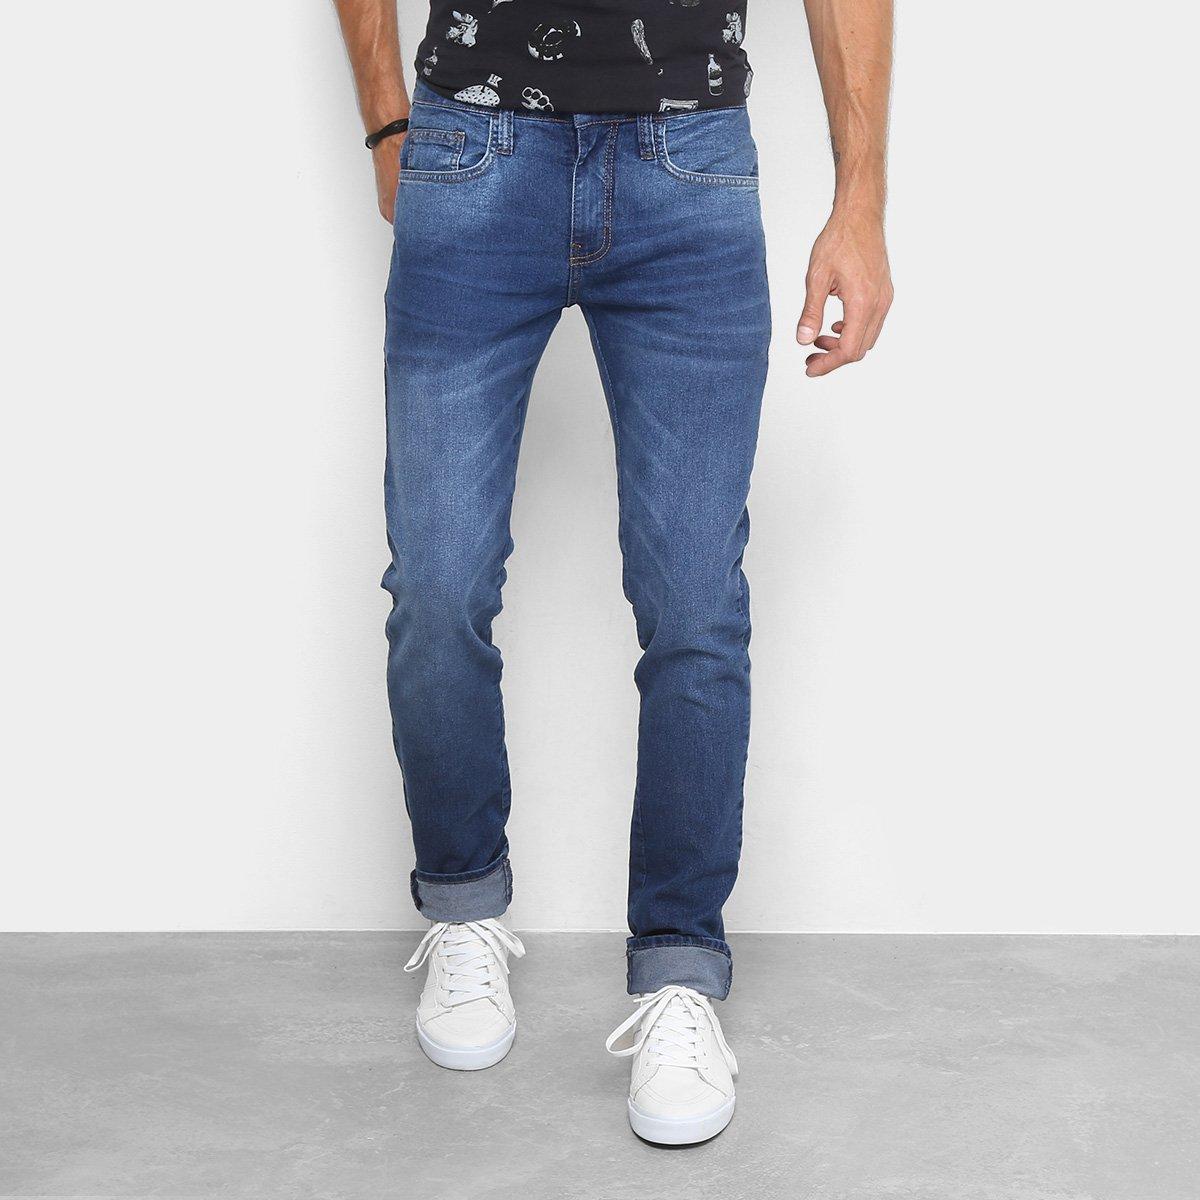 cb62e933f Calça Jeans Skinny Colcci Alex Masculina - Compre Agora   Netshoes